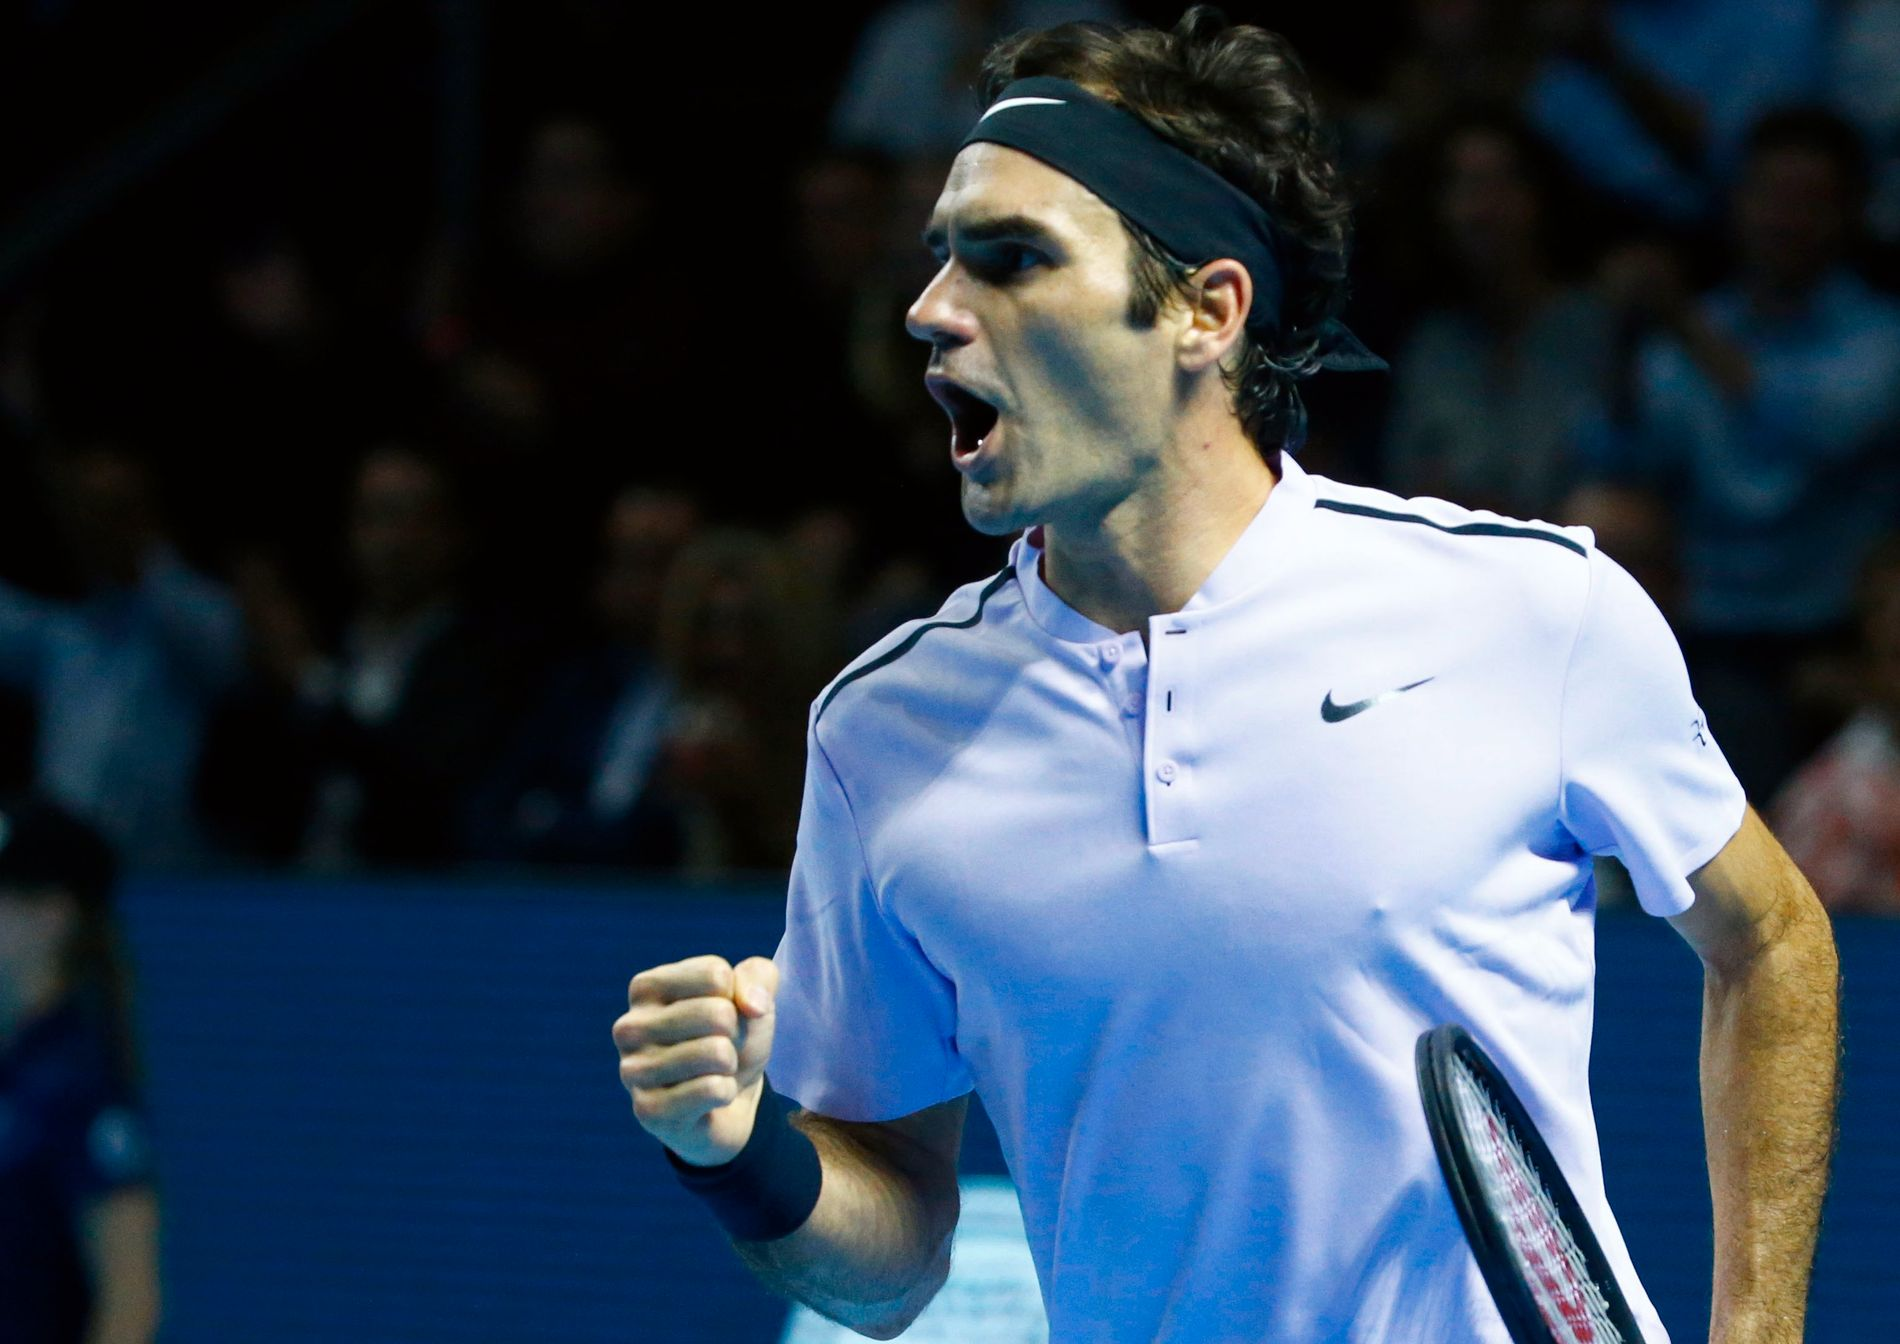 VANT -IGJEN: Foran hjemmepublikummet Basel kunne Roger Federer (36) løfte sin syvende turneringspokal i 2017.